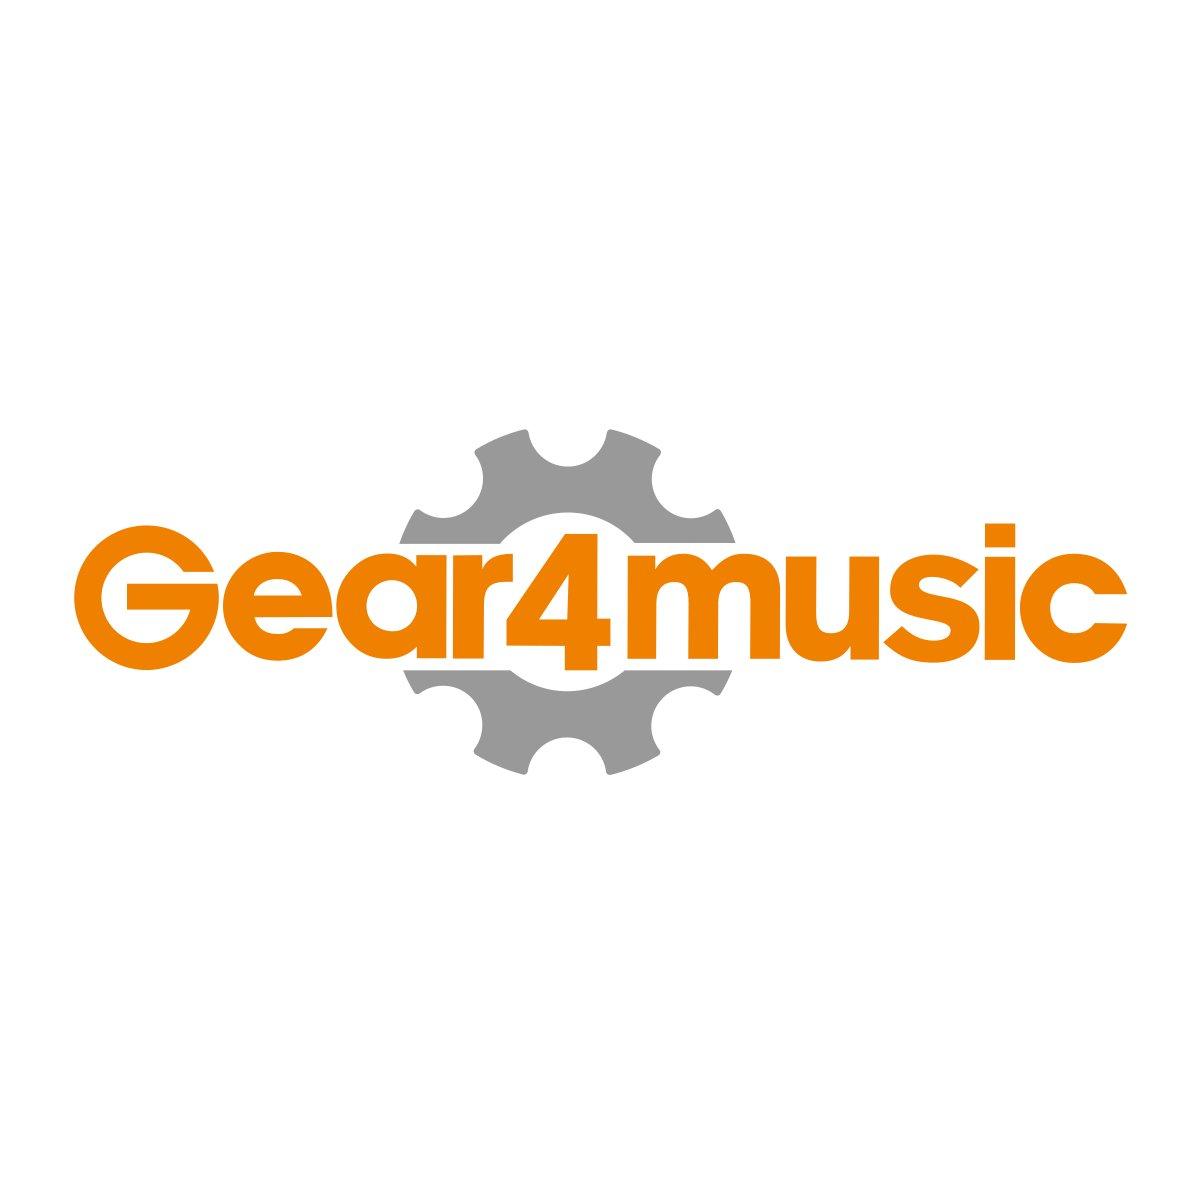 zildjian k custom 13 1 4 39 39 hybrid hi hat cymbals at gear4music. Black Bedroom Furniture Sets. Home Design Ideas